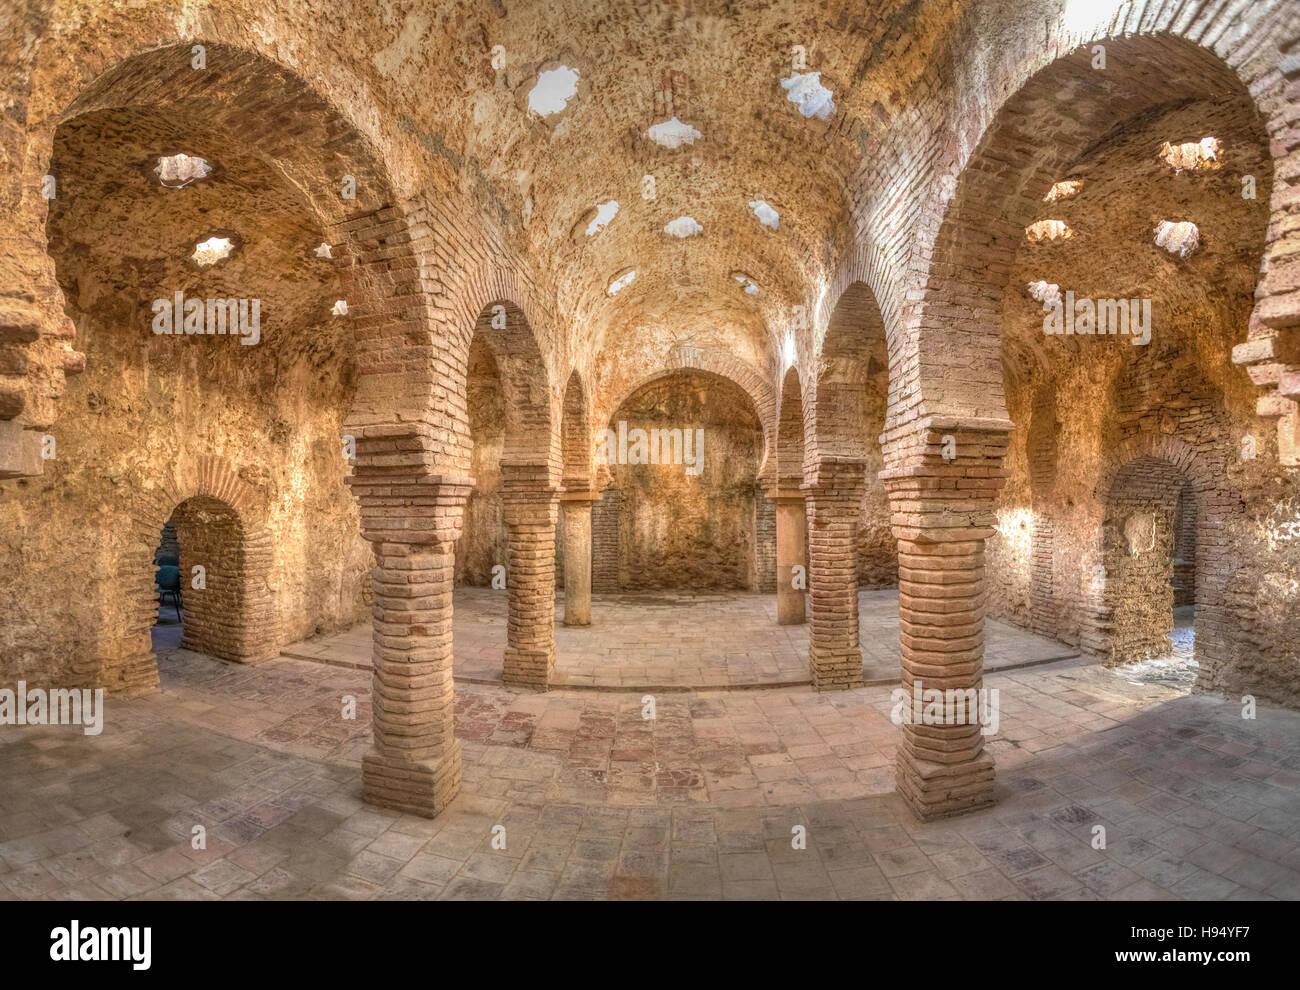 Baños árabes construidos en el siglo XIII, Ronda, Andalucia, Spain Imagen De Stock